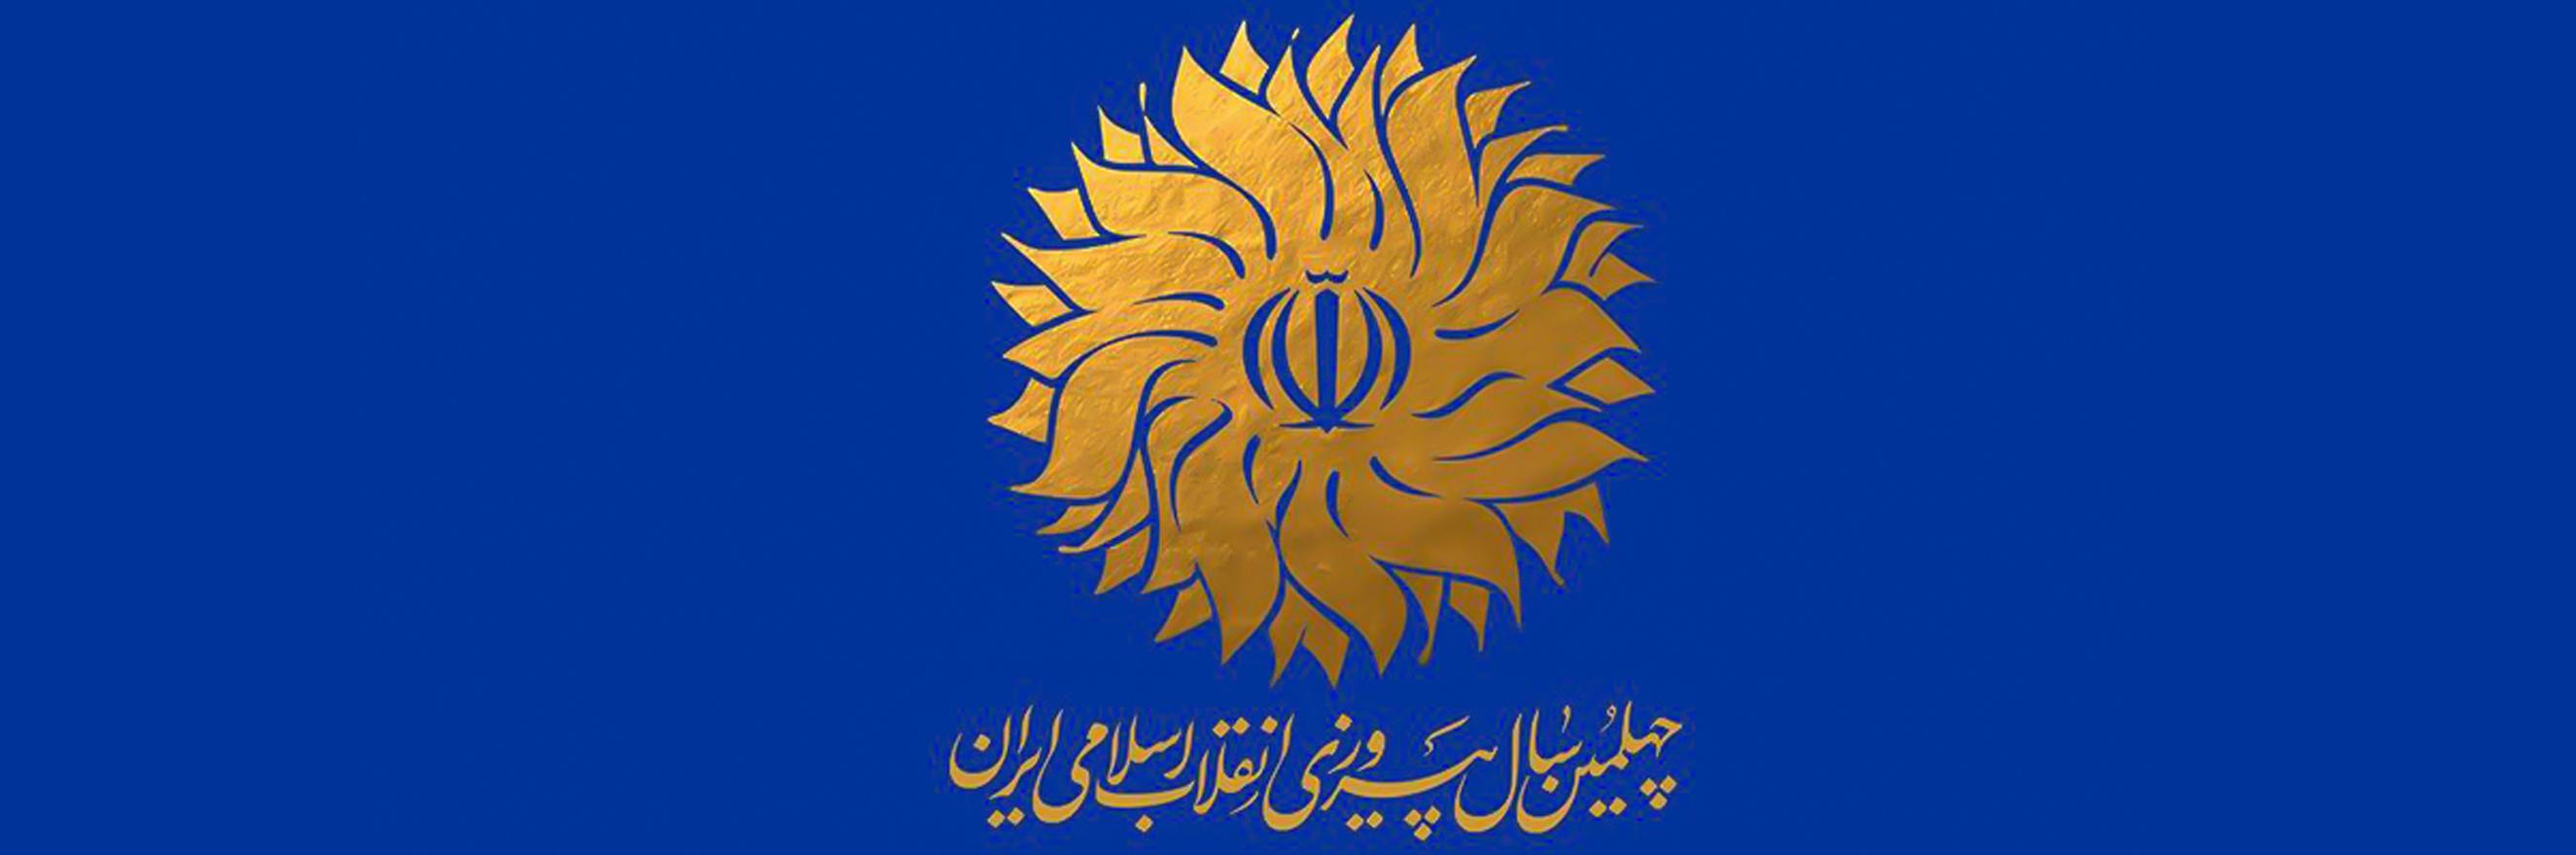 چهلمین سال پیروزی انفلاب اسلامی